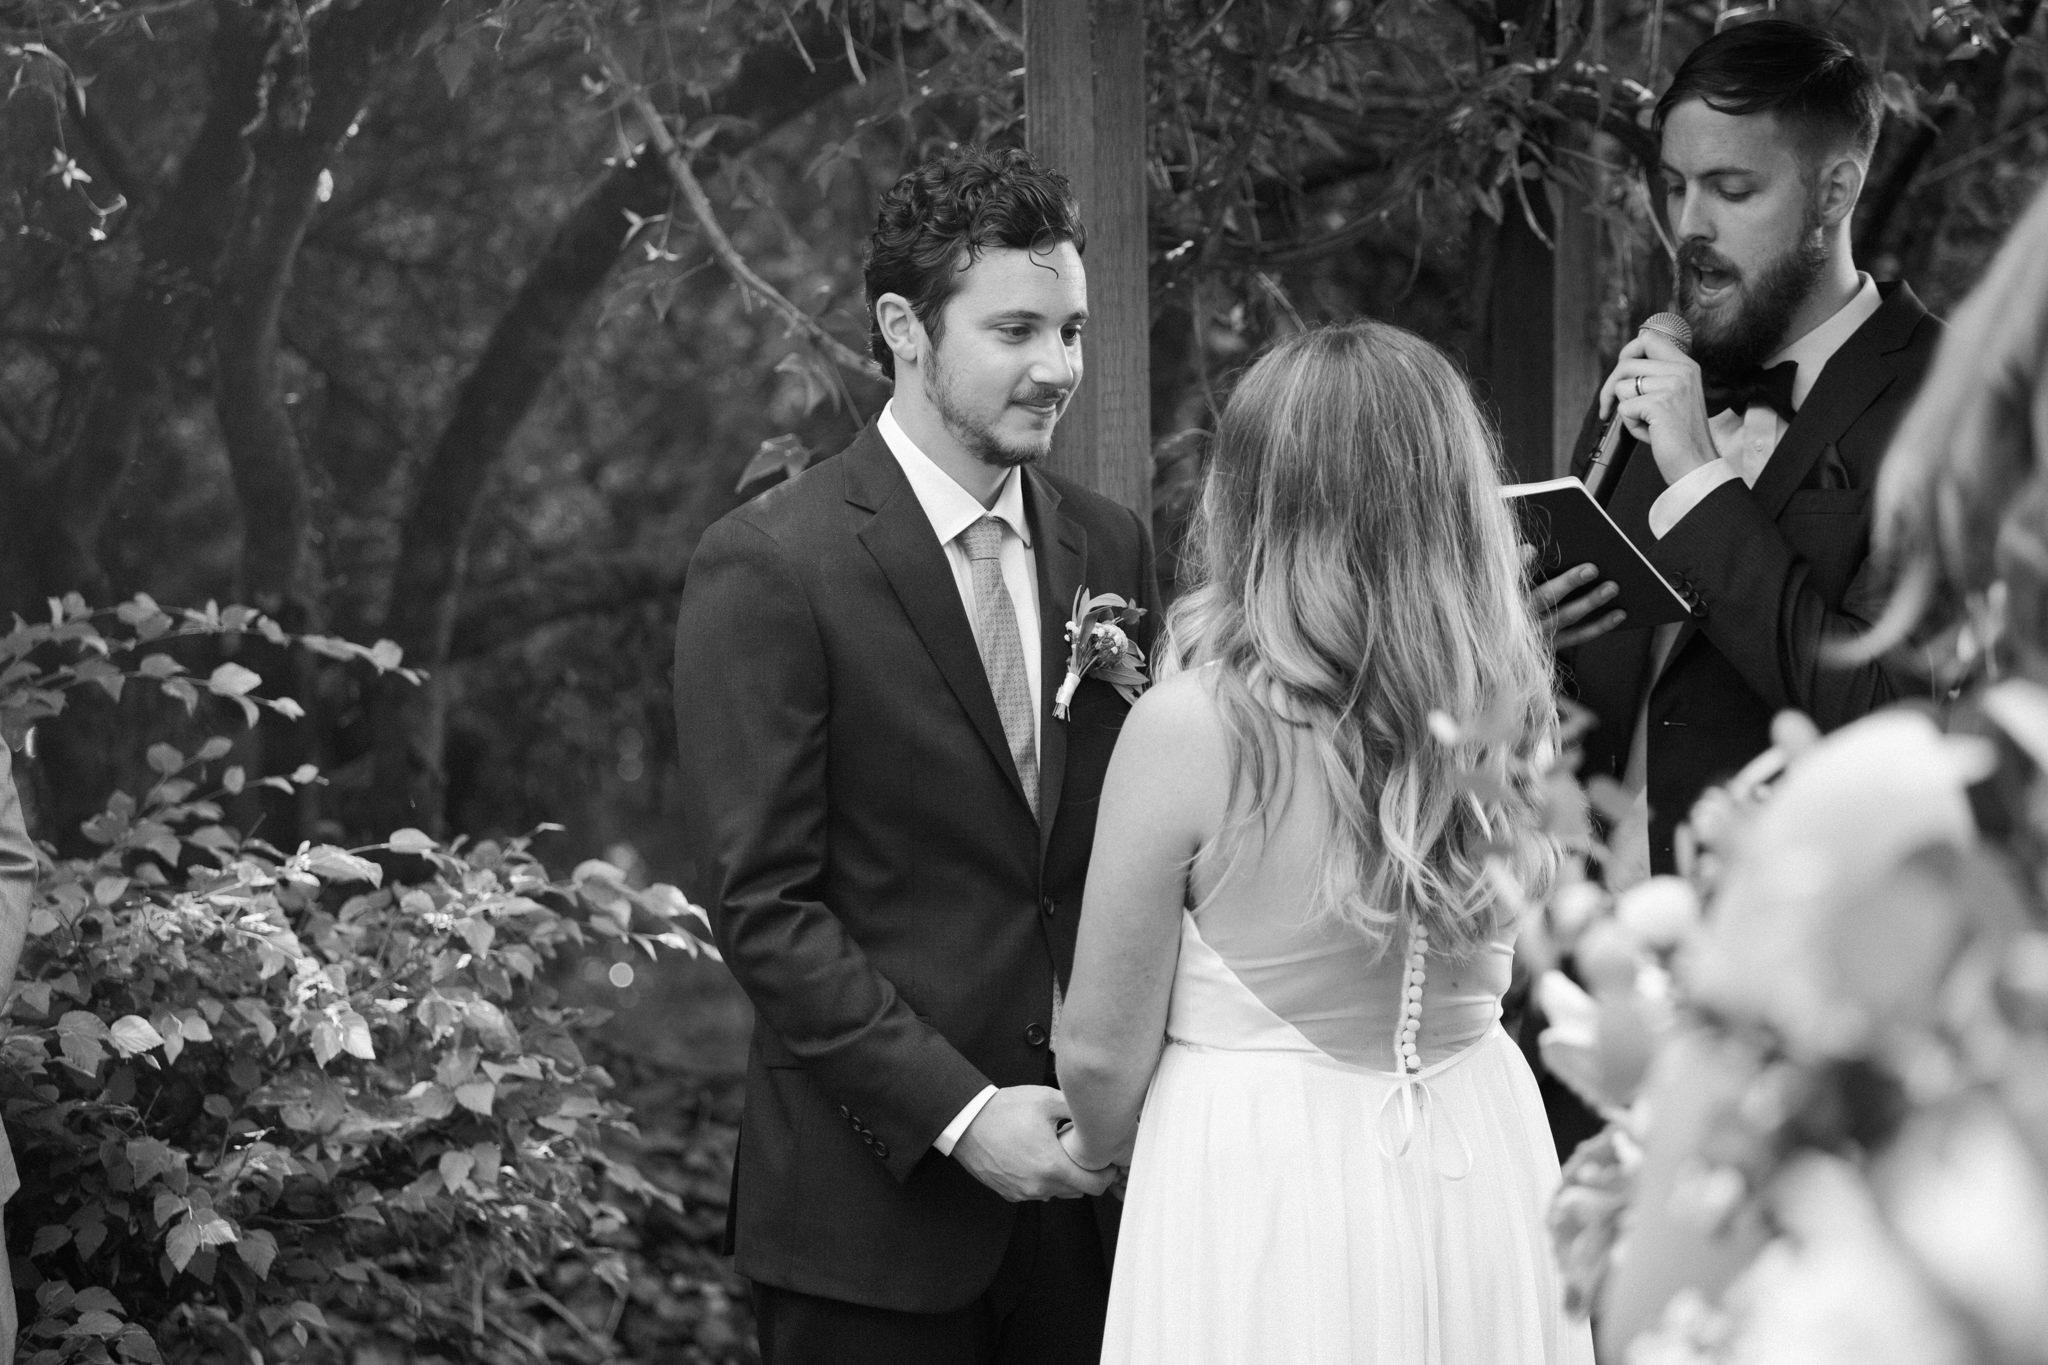 Backyard-Bainbridge-Island-Wedding-Alycia-Lovell-Photography-102.JPG